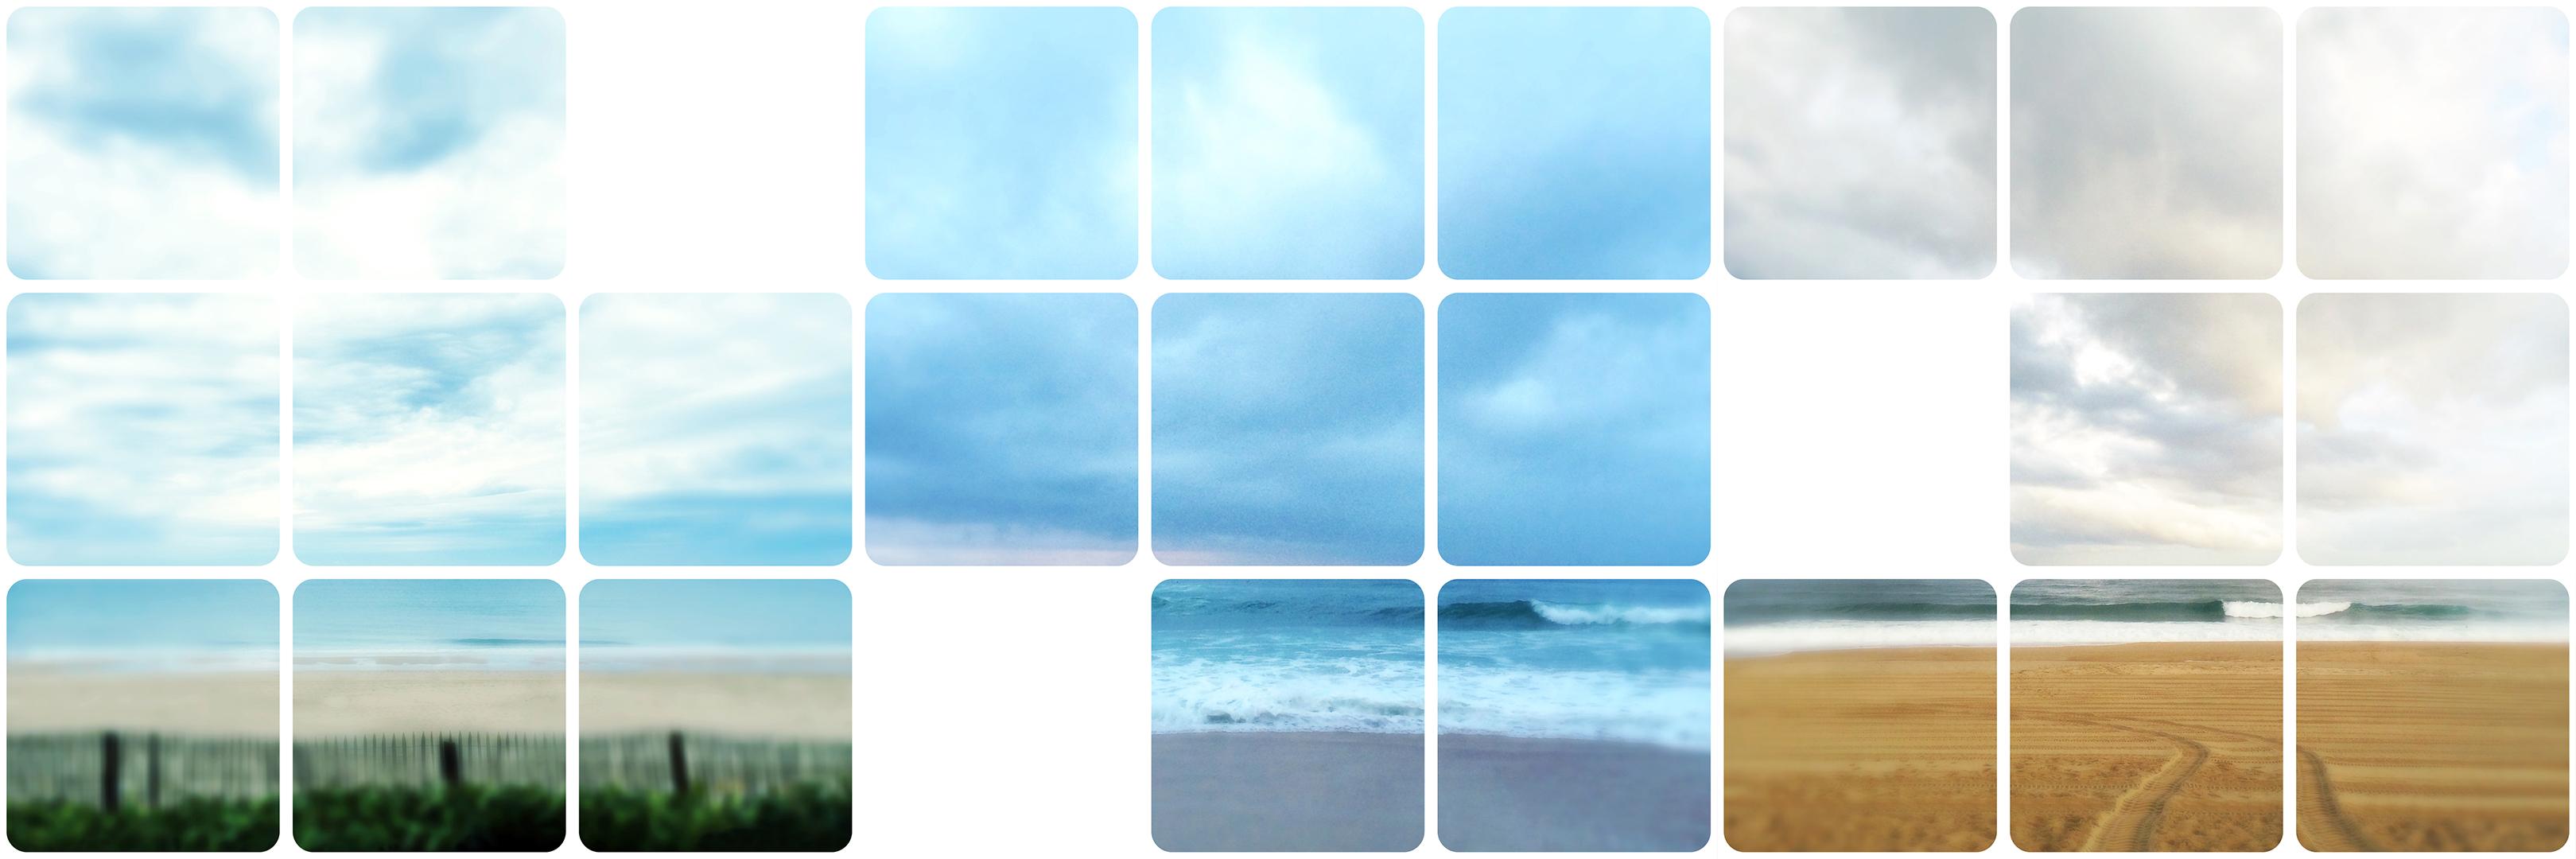 Next horizon 06